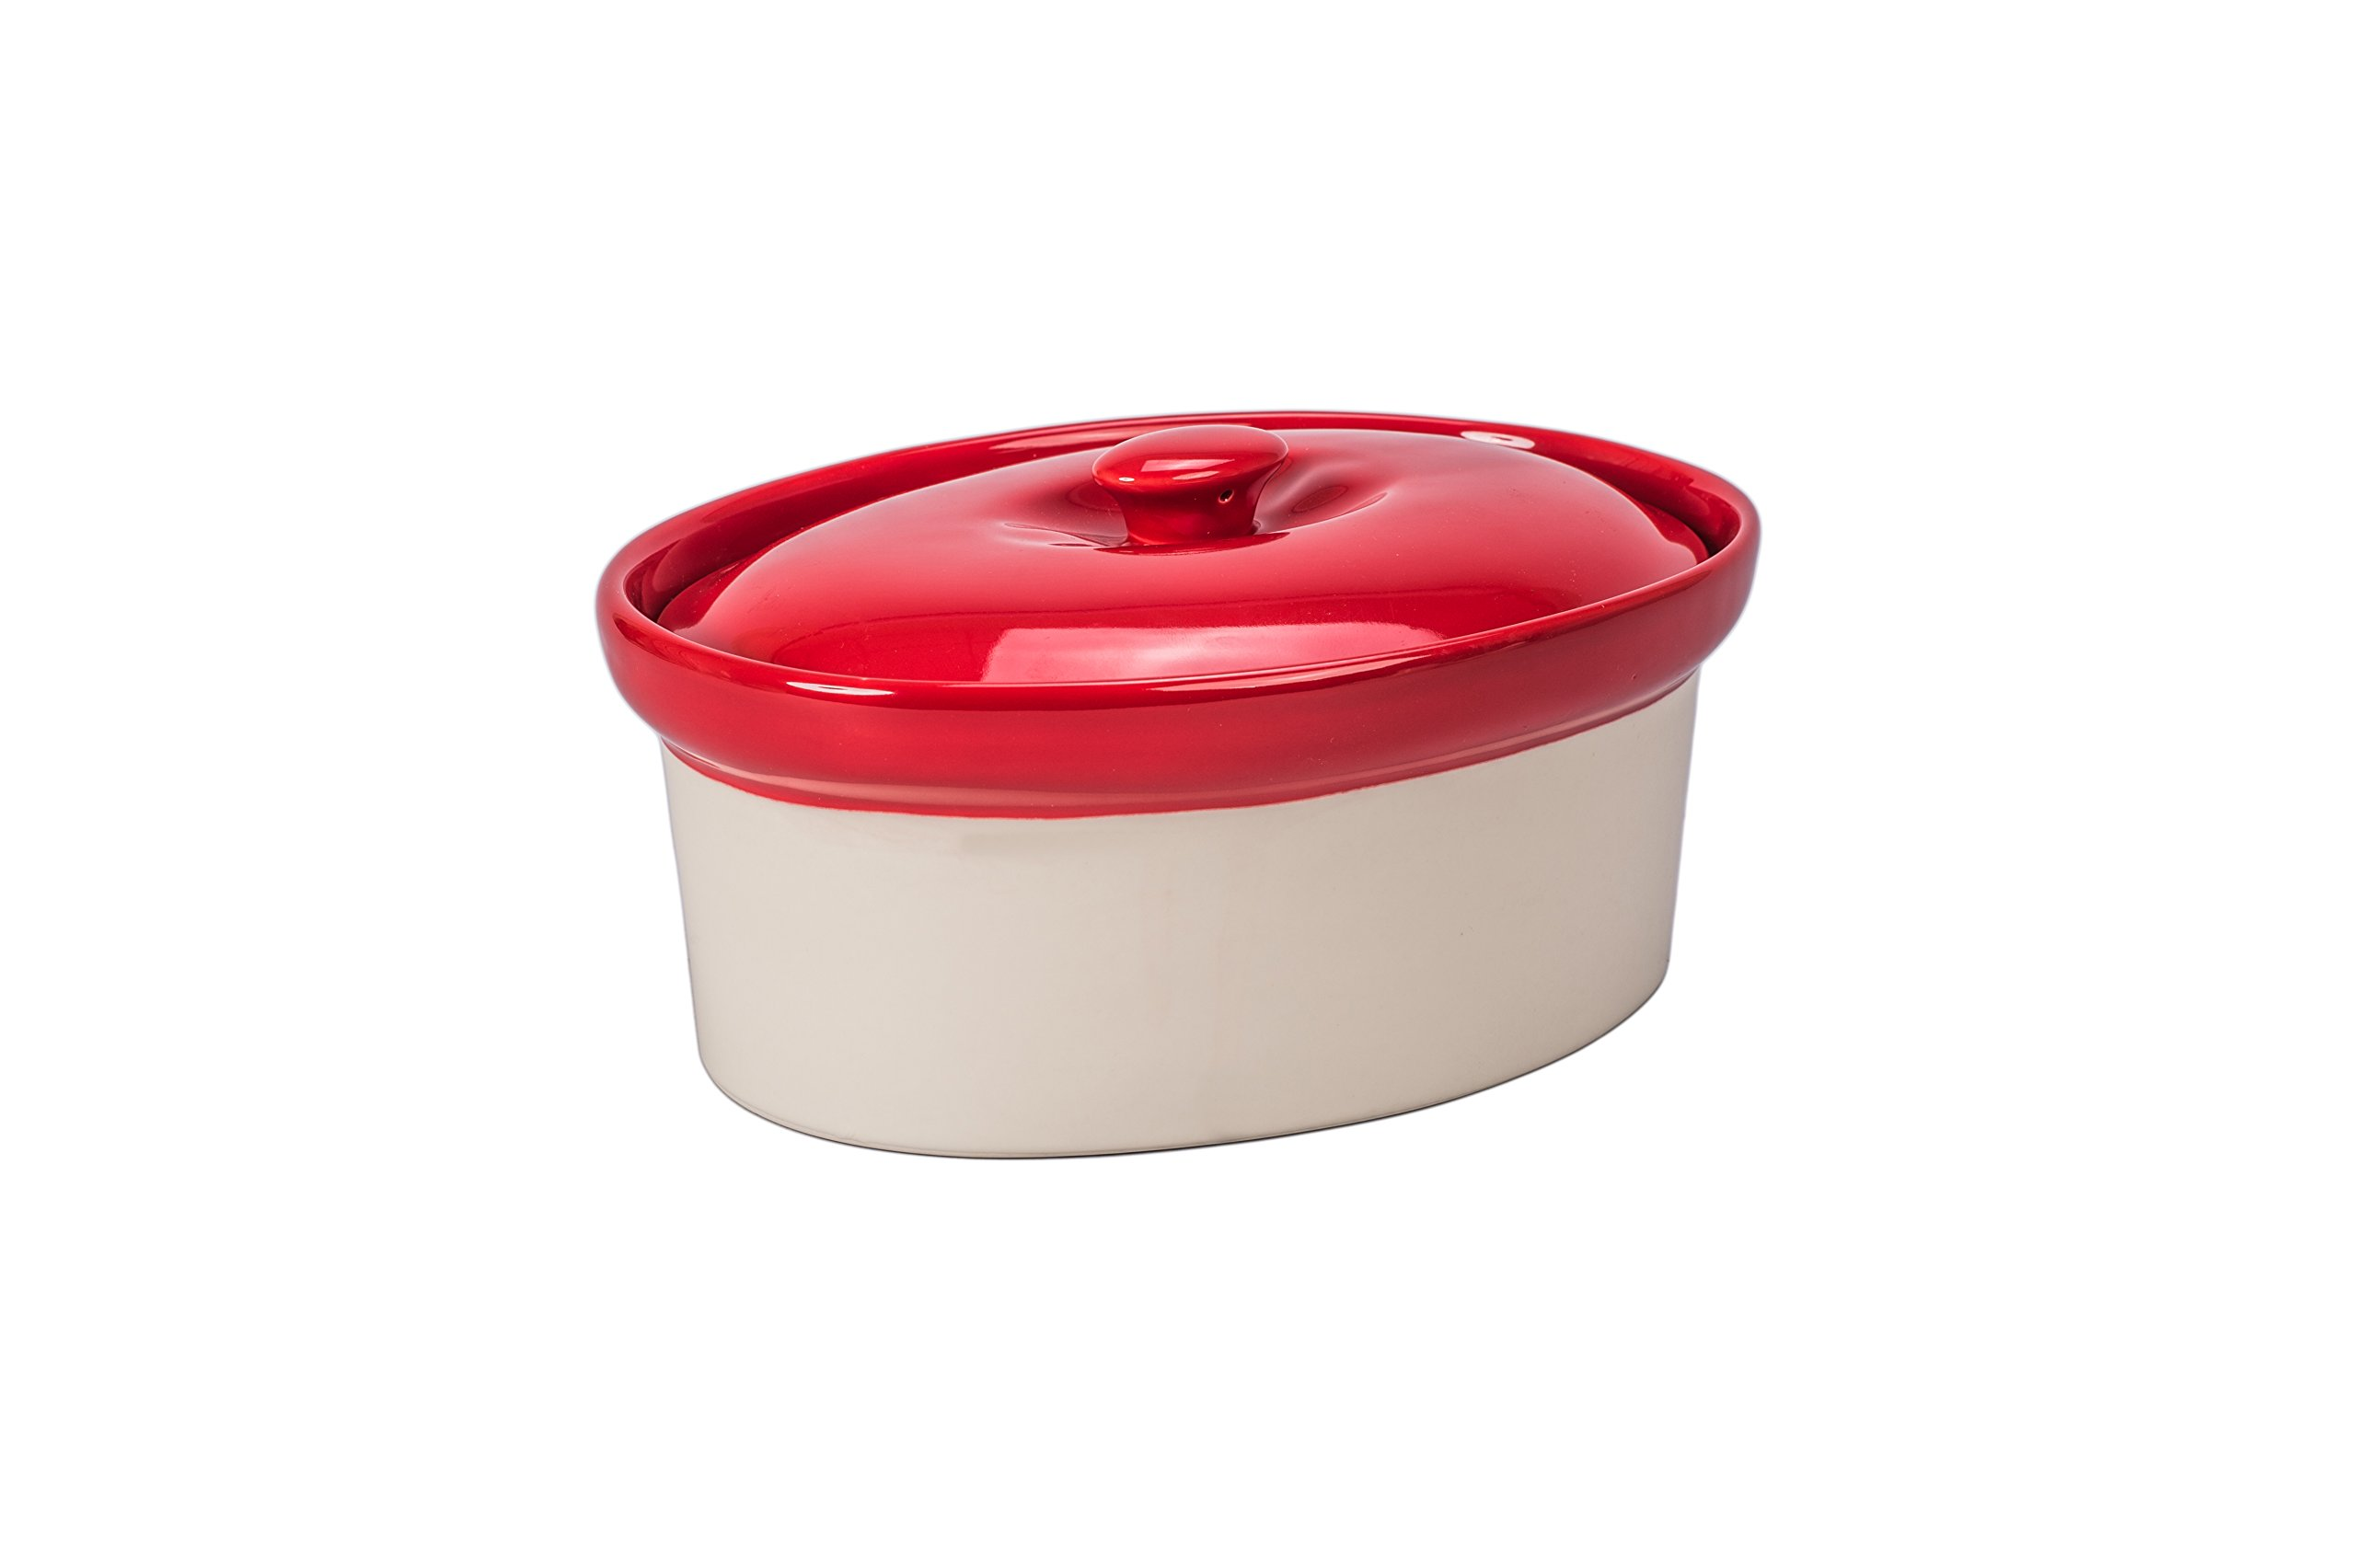 BIA Cordon Bleu Quatro 1.5-Quart Oval Casserole Baking Dish, Sand/Spice Red